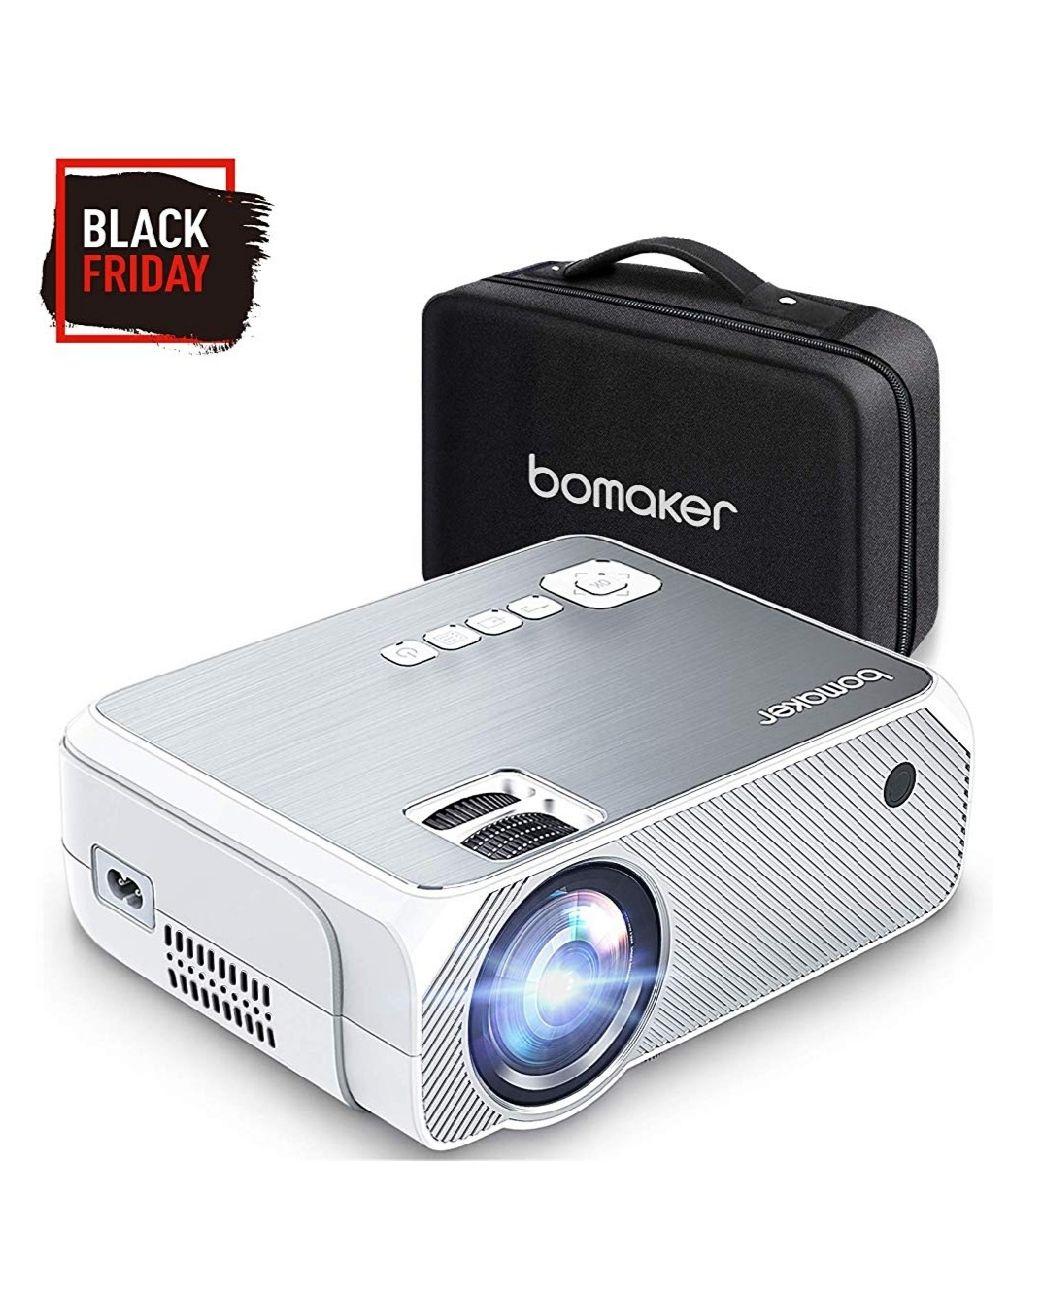 Proyector BOMAKER 4000 Lúmenes, Soporte Full HD 1080p, Pantalla de 250 Pulgadas